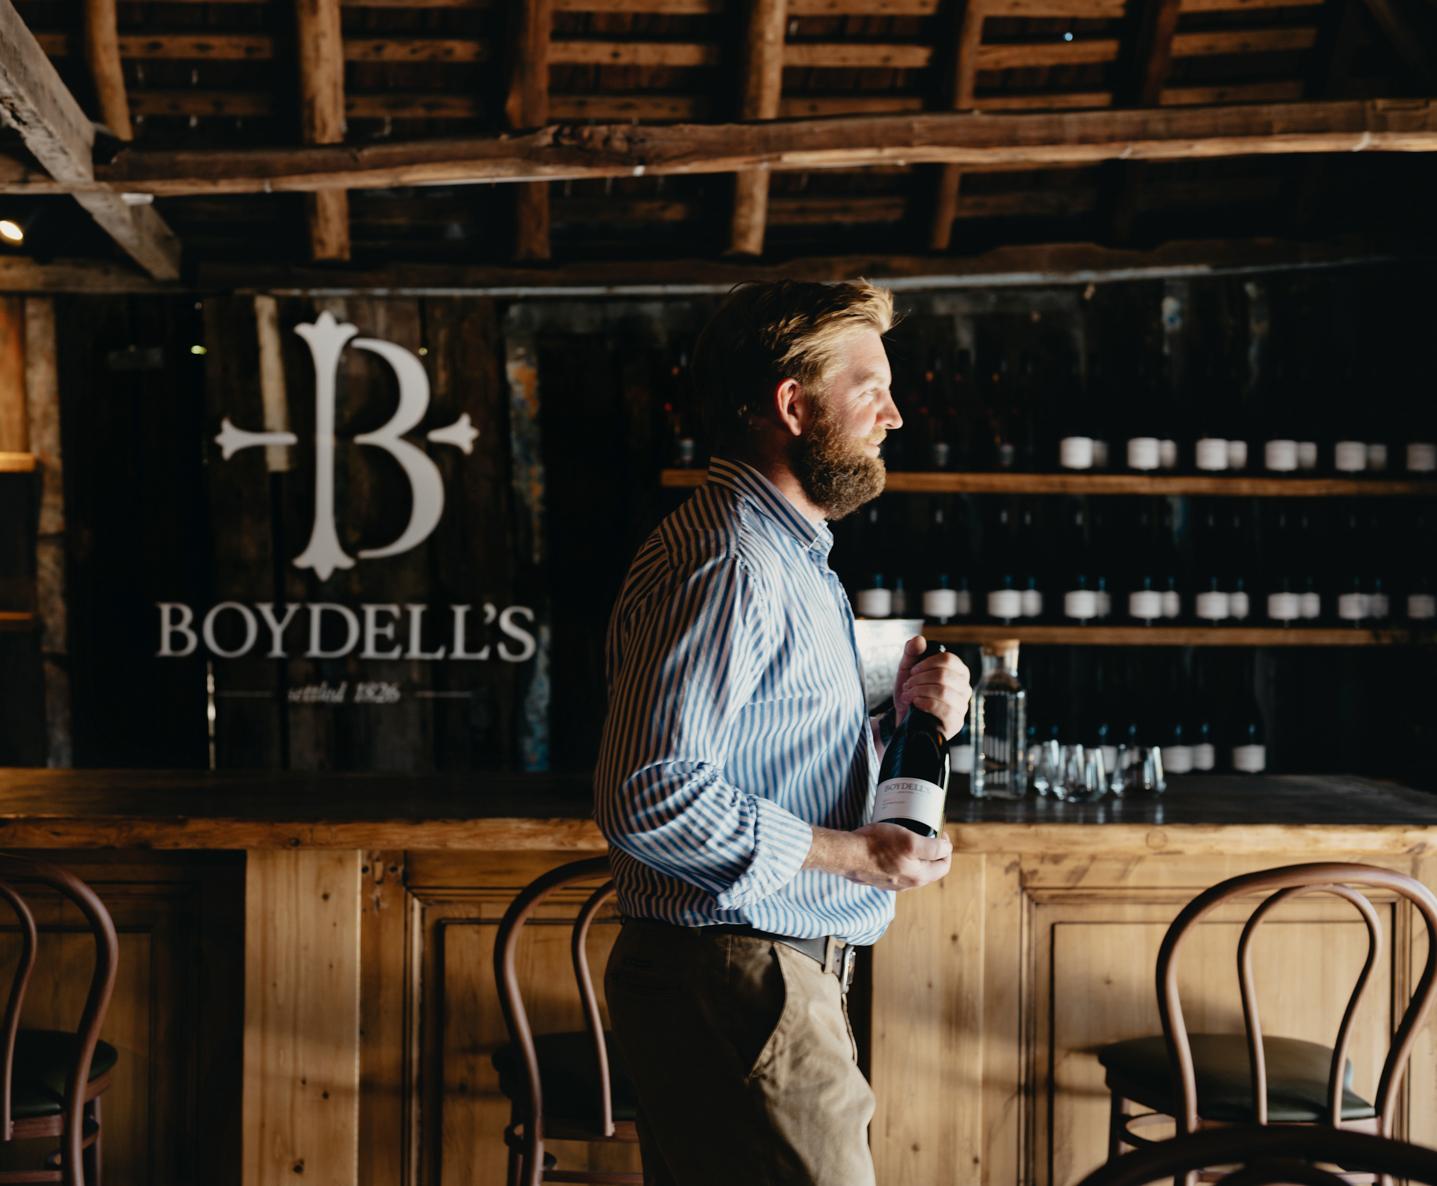 Daniel Maroulis of Boydell's